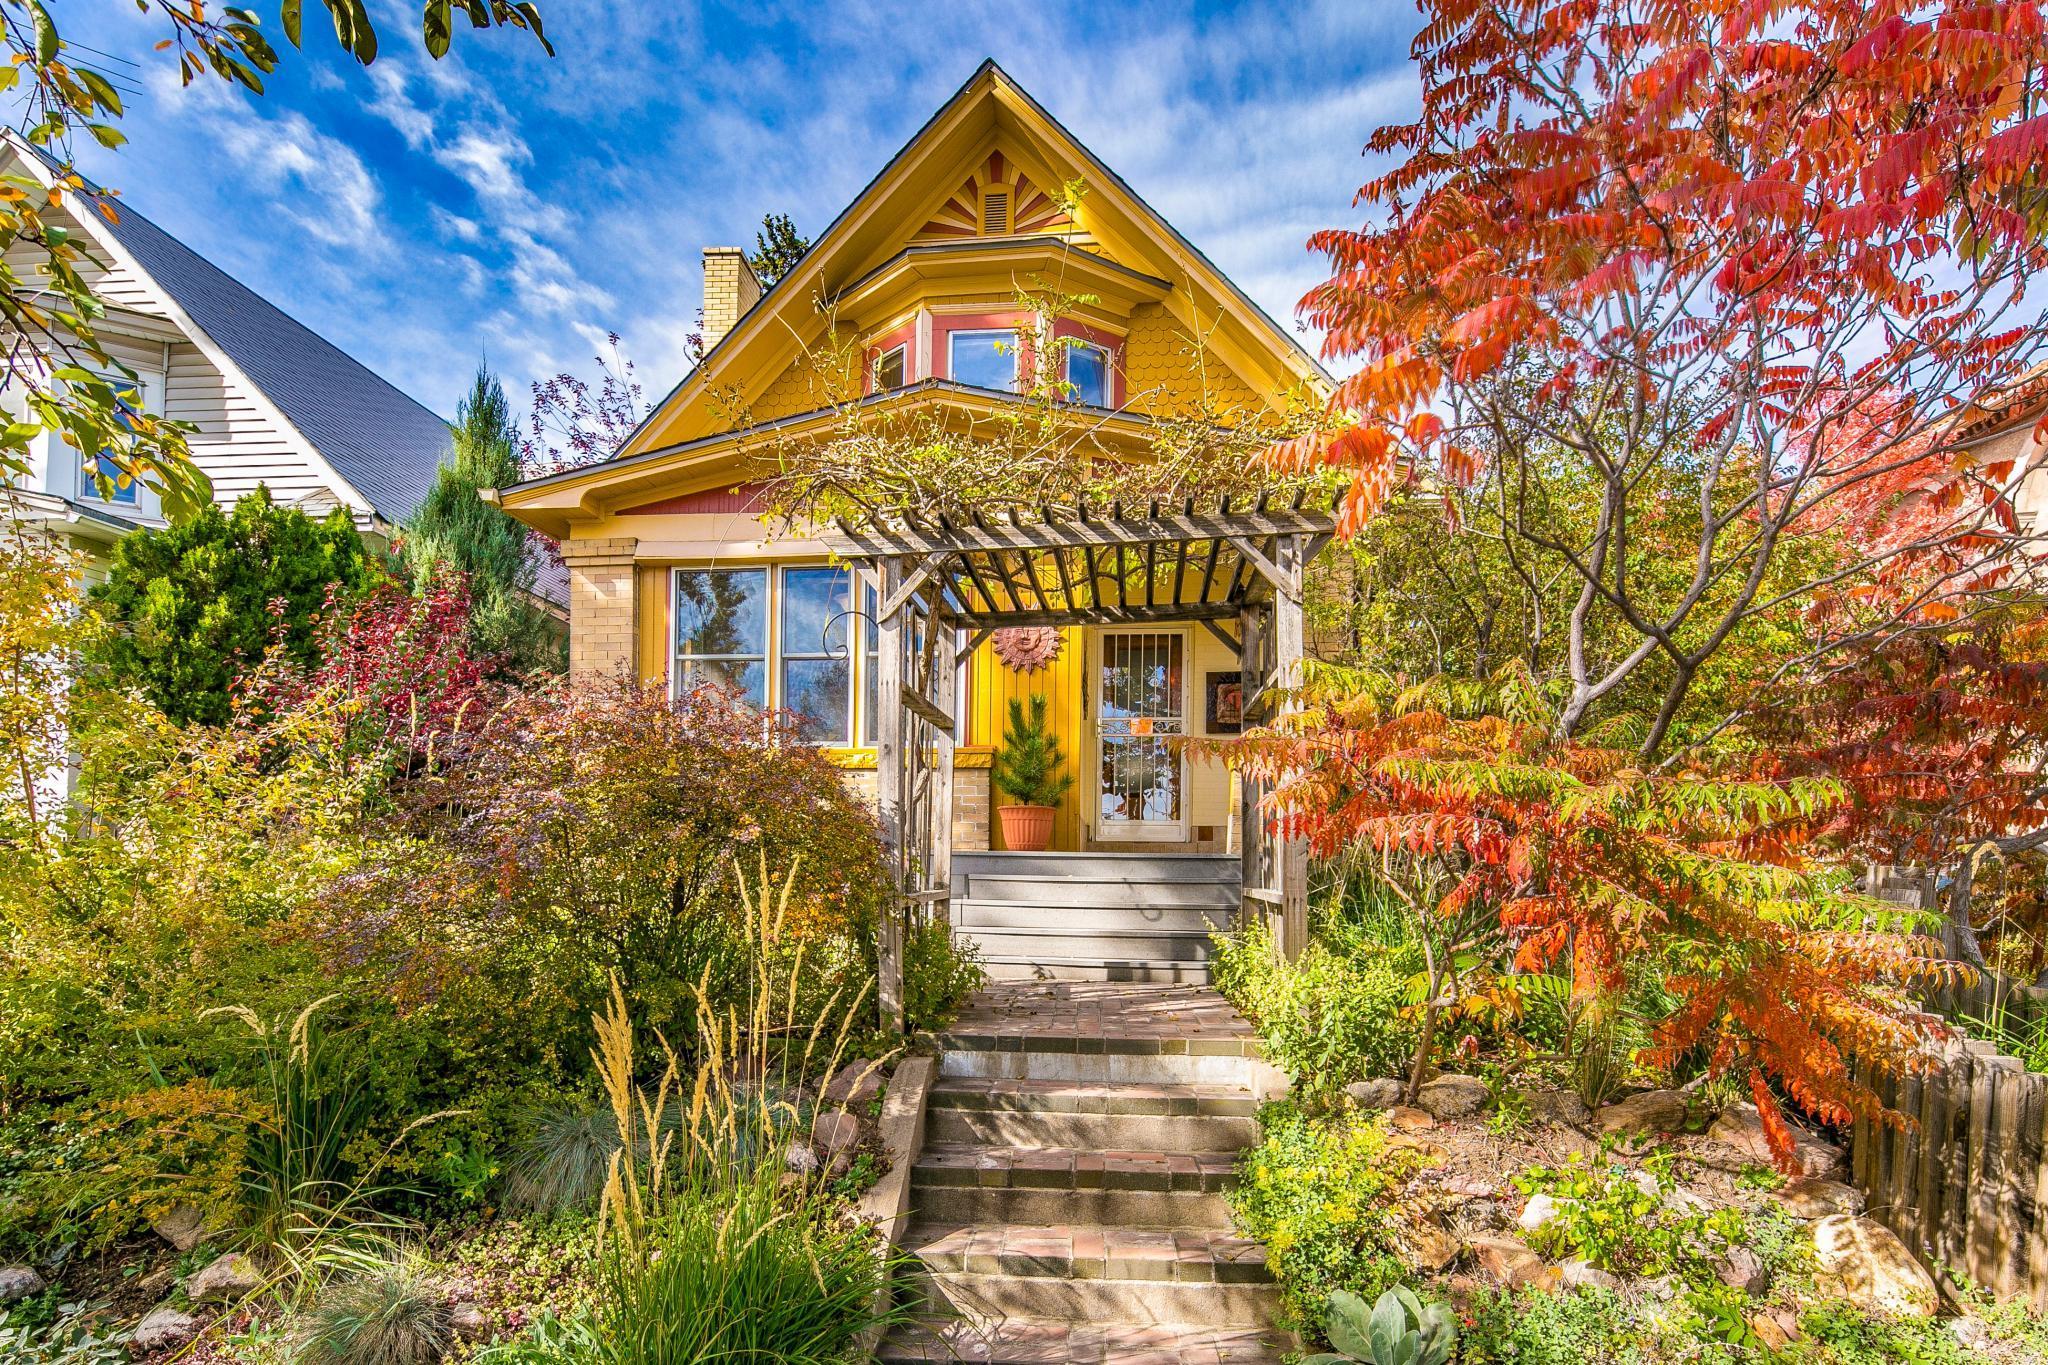 3025 Grove St, Denver, CO 80211 For Rent   Trulia